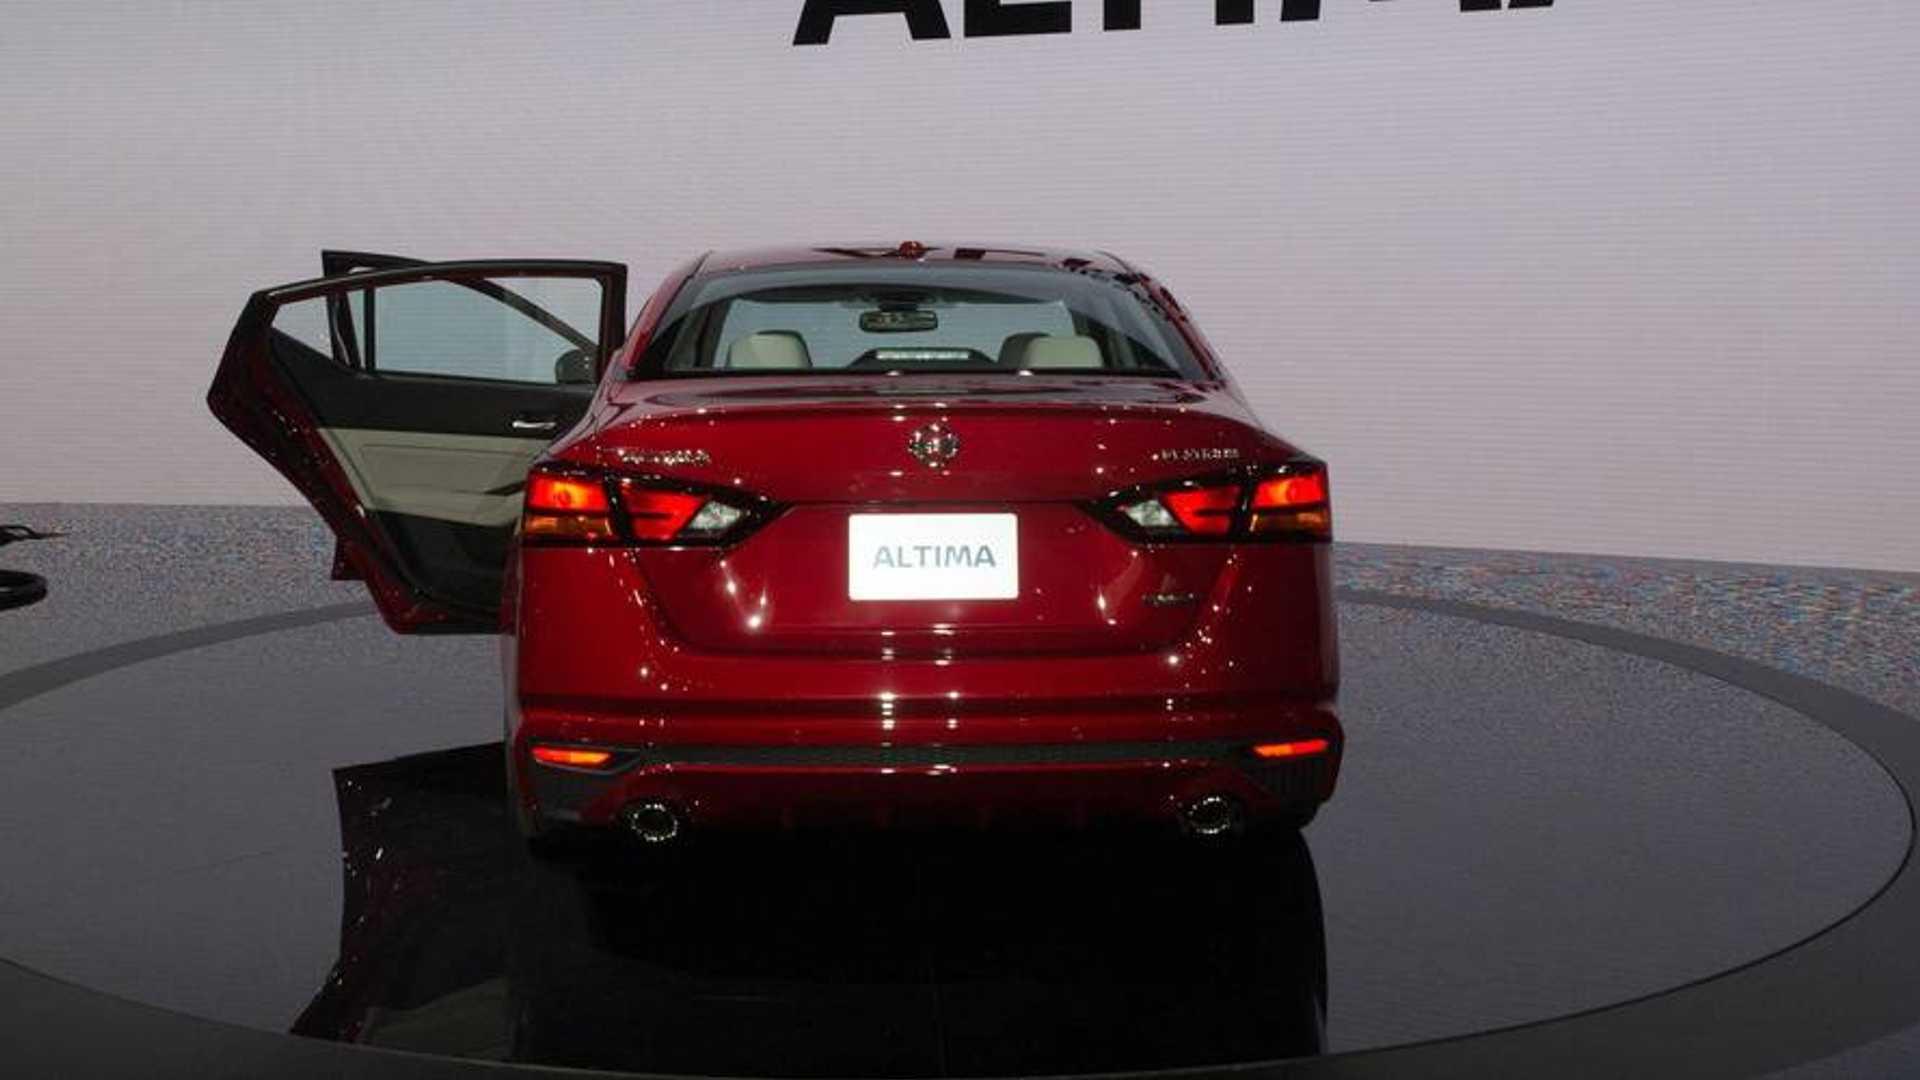 Nissan Altima: Speaker Adaptation function